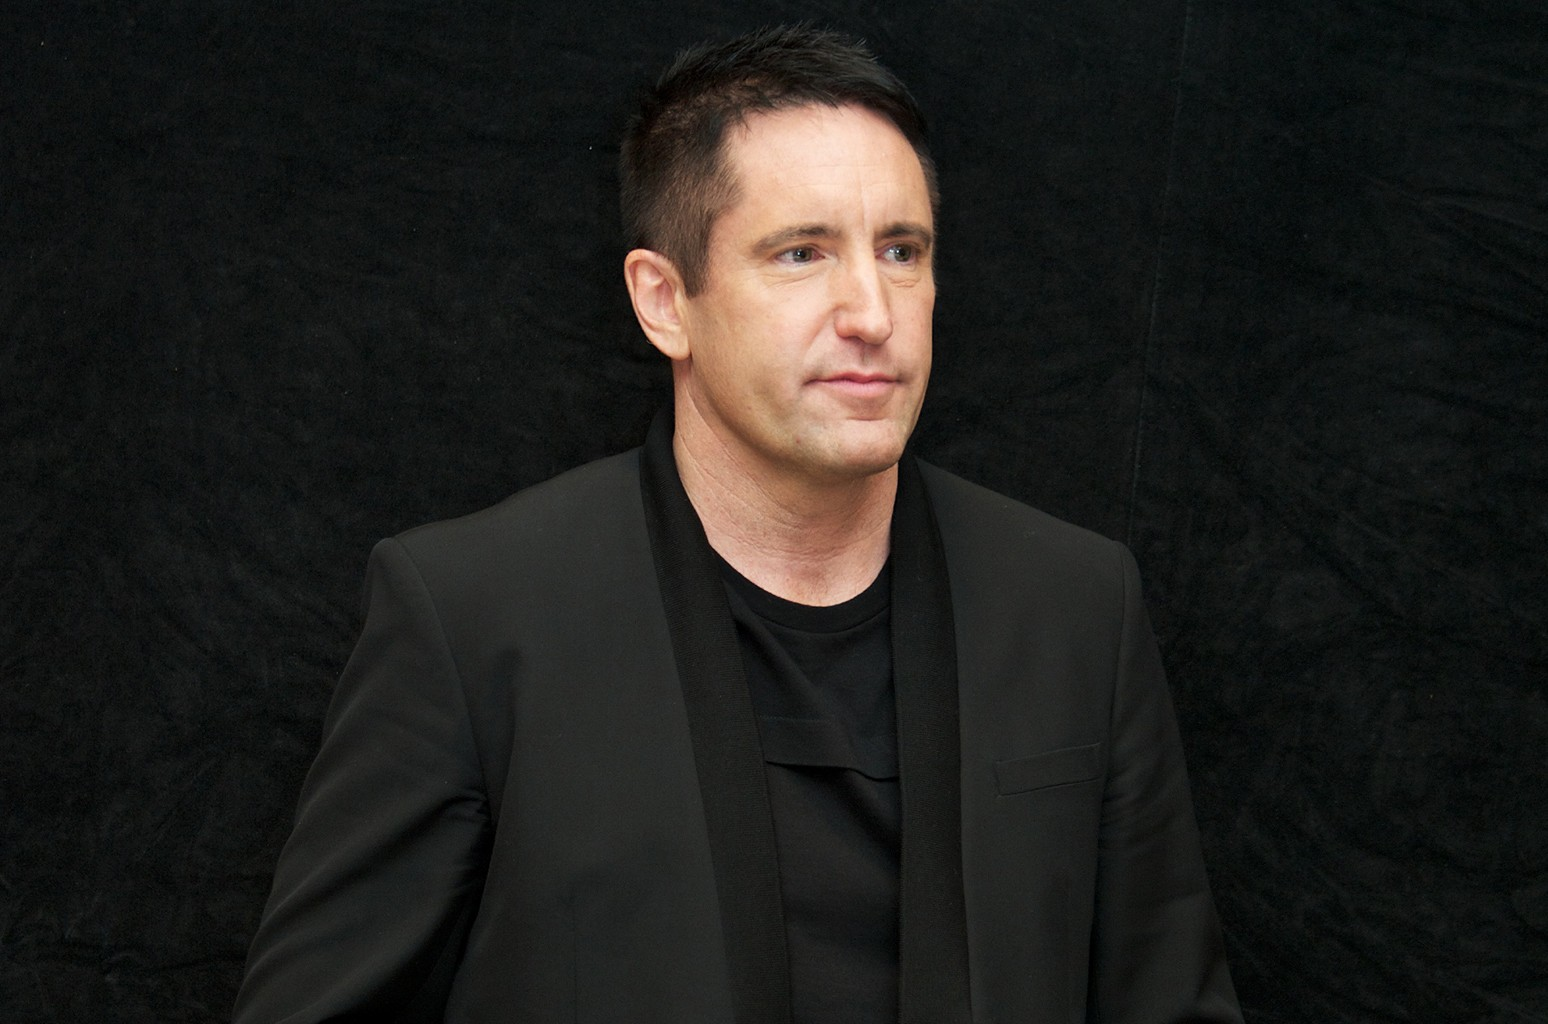 Trent Reznor in 2014